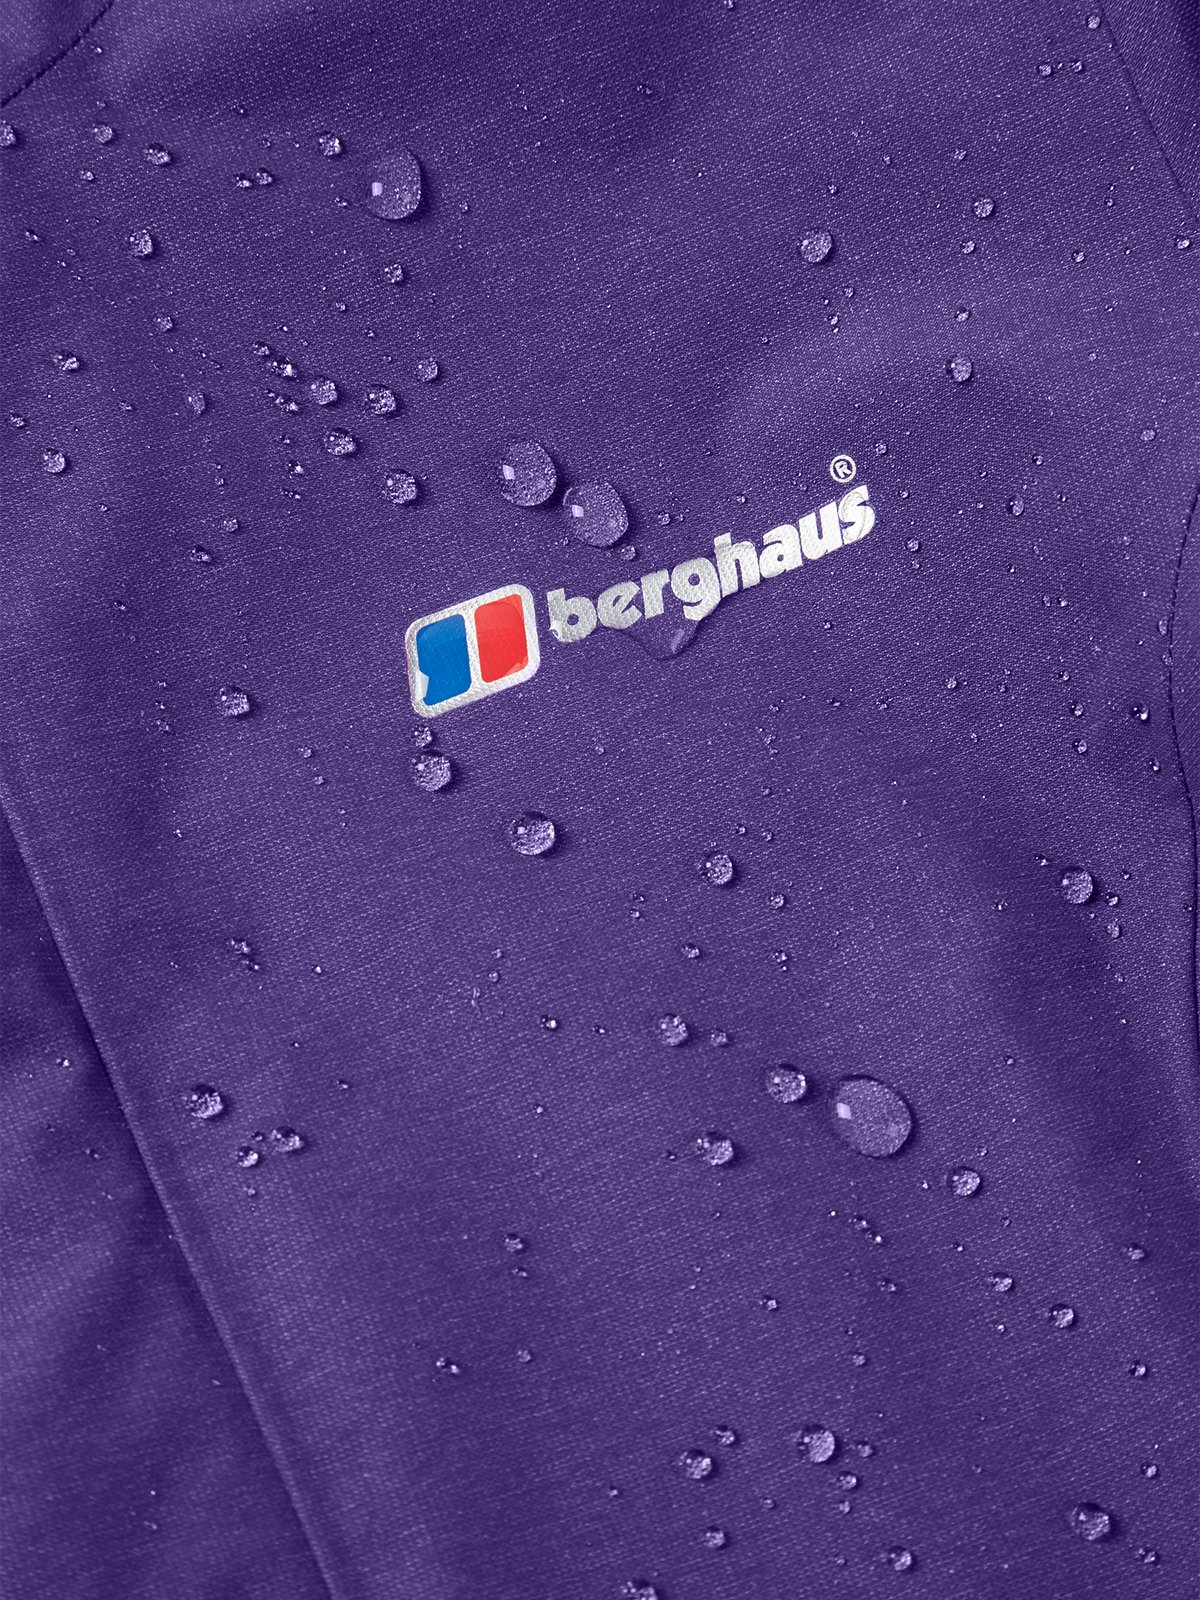 91oxcLxUSRL - Berghaus Women's Elara Waterproof Jacket